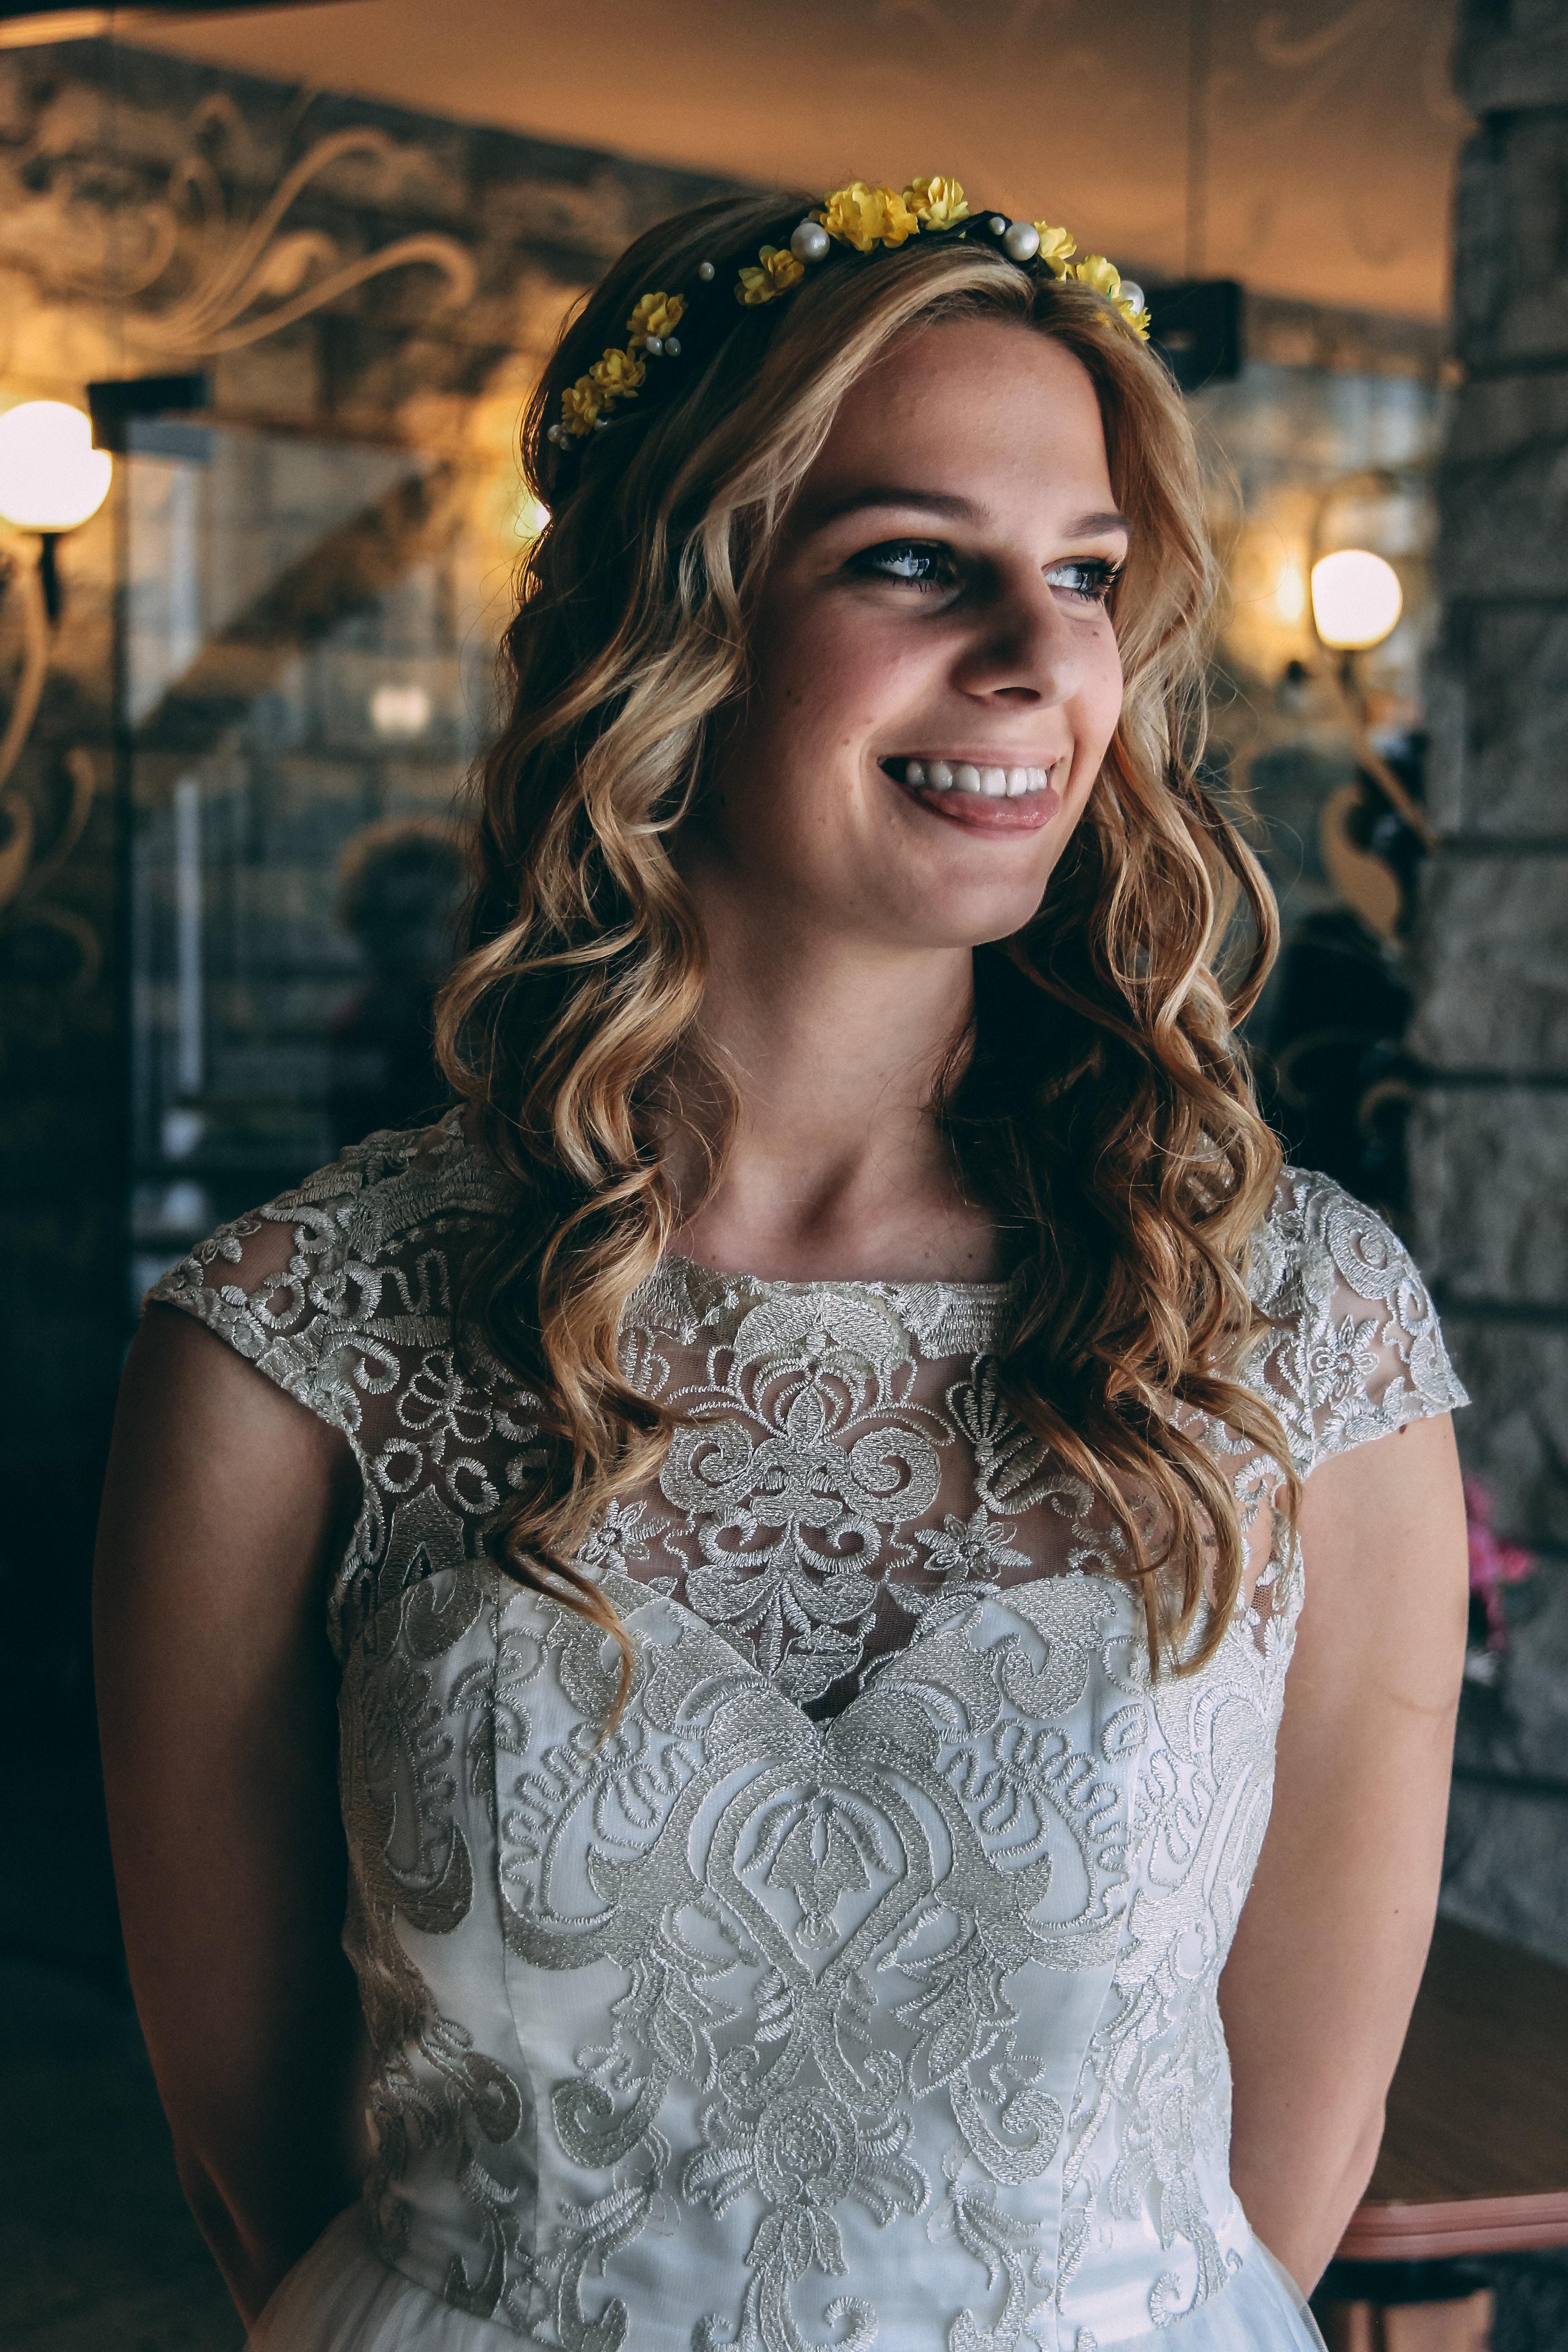 woman smiling while taking photo